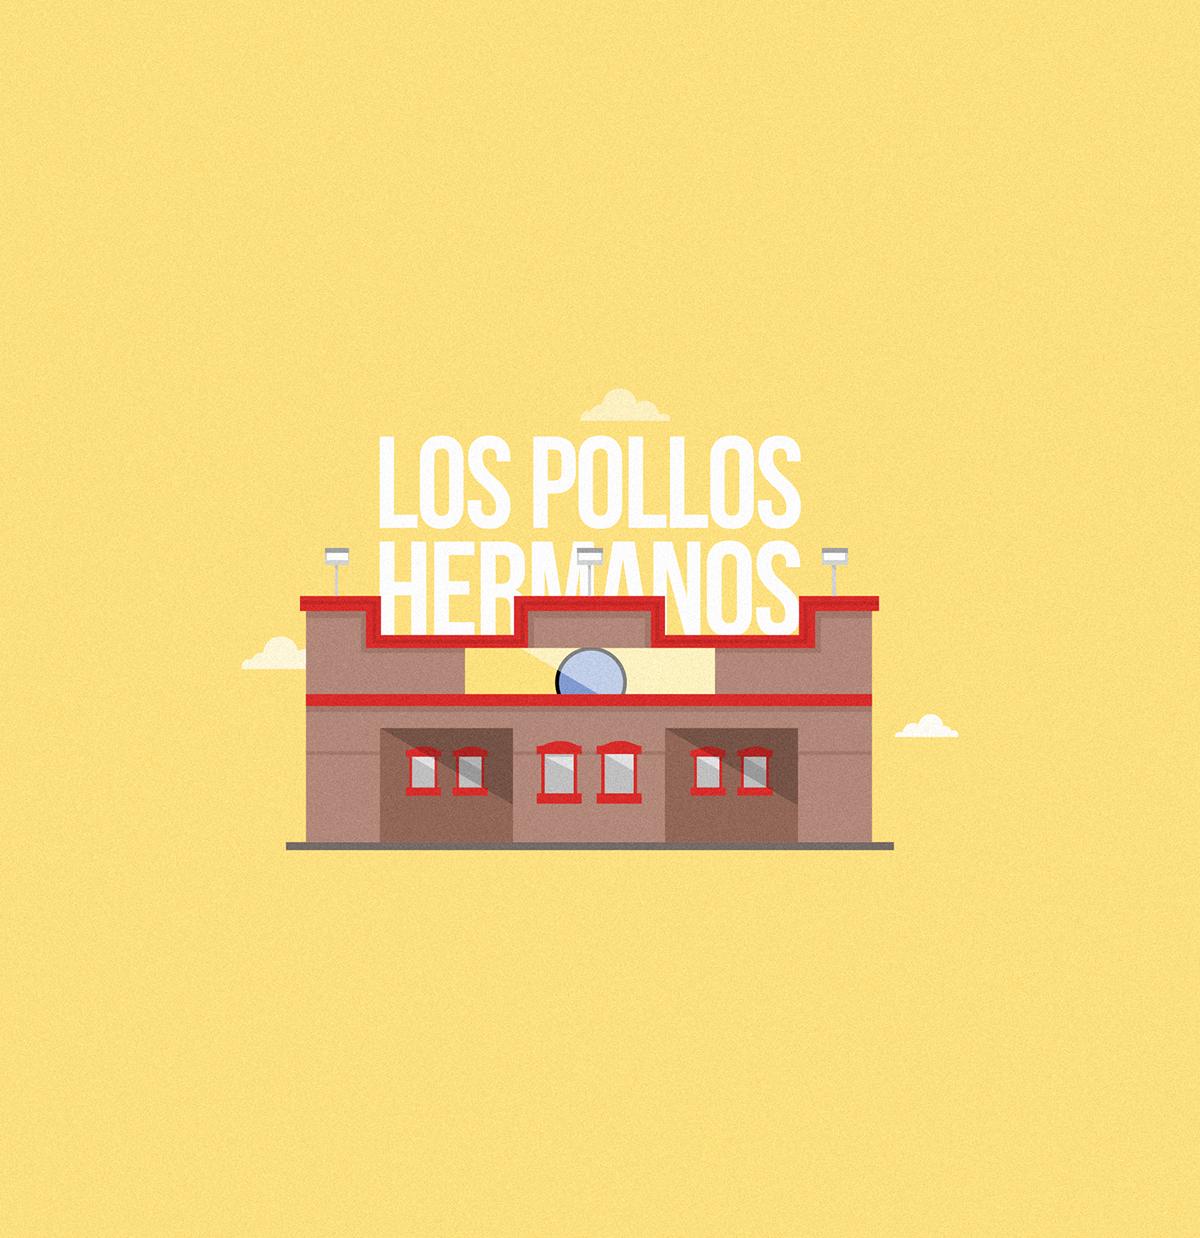 breaking bad,heisenberg,tribute,walter white,BrBa,saul goodman,tv,uruguay,architecture,facade